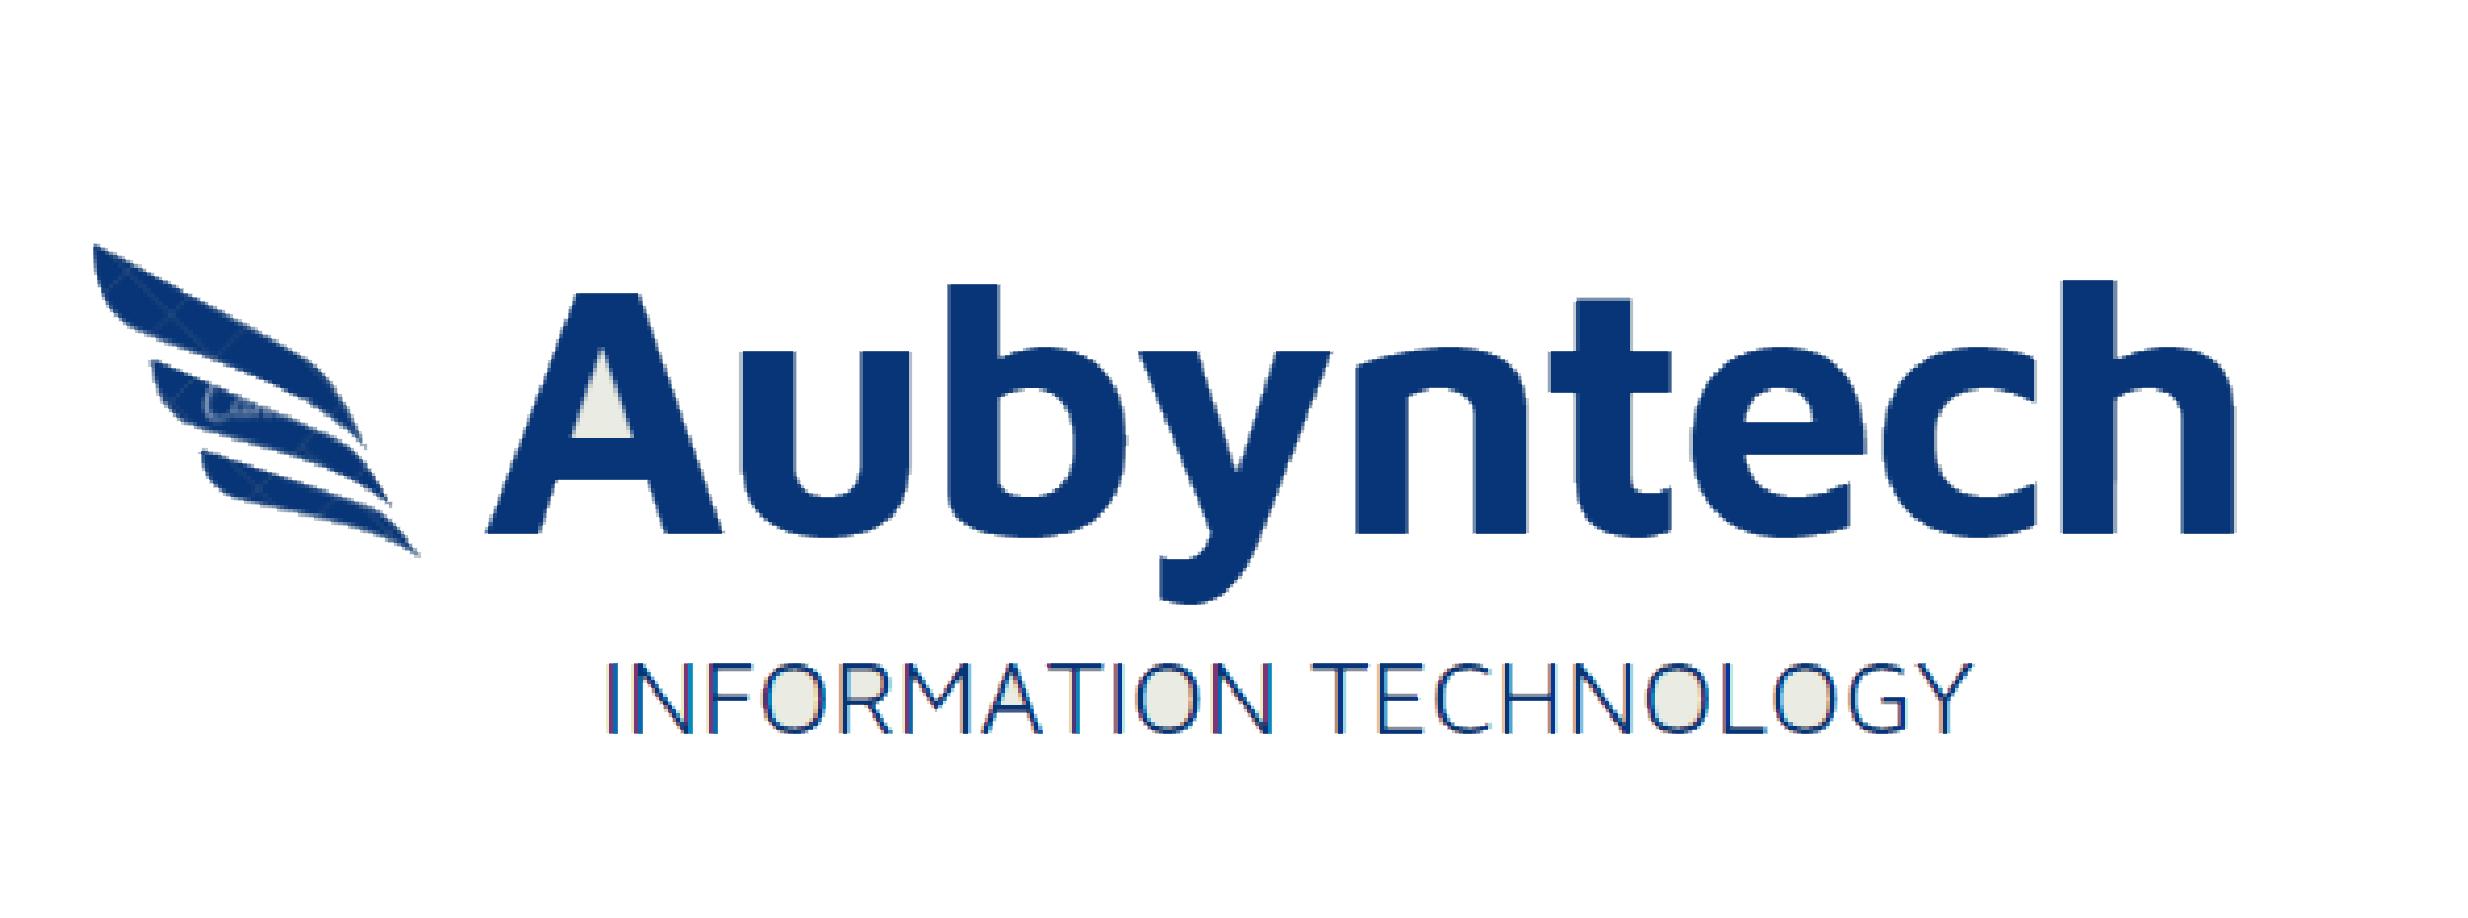 Aubyntech Information Technology